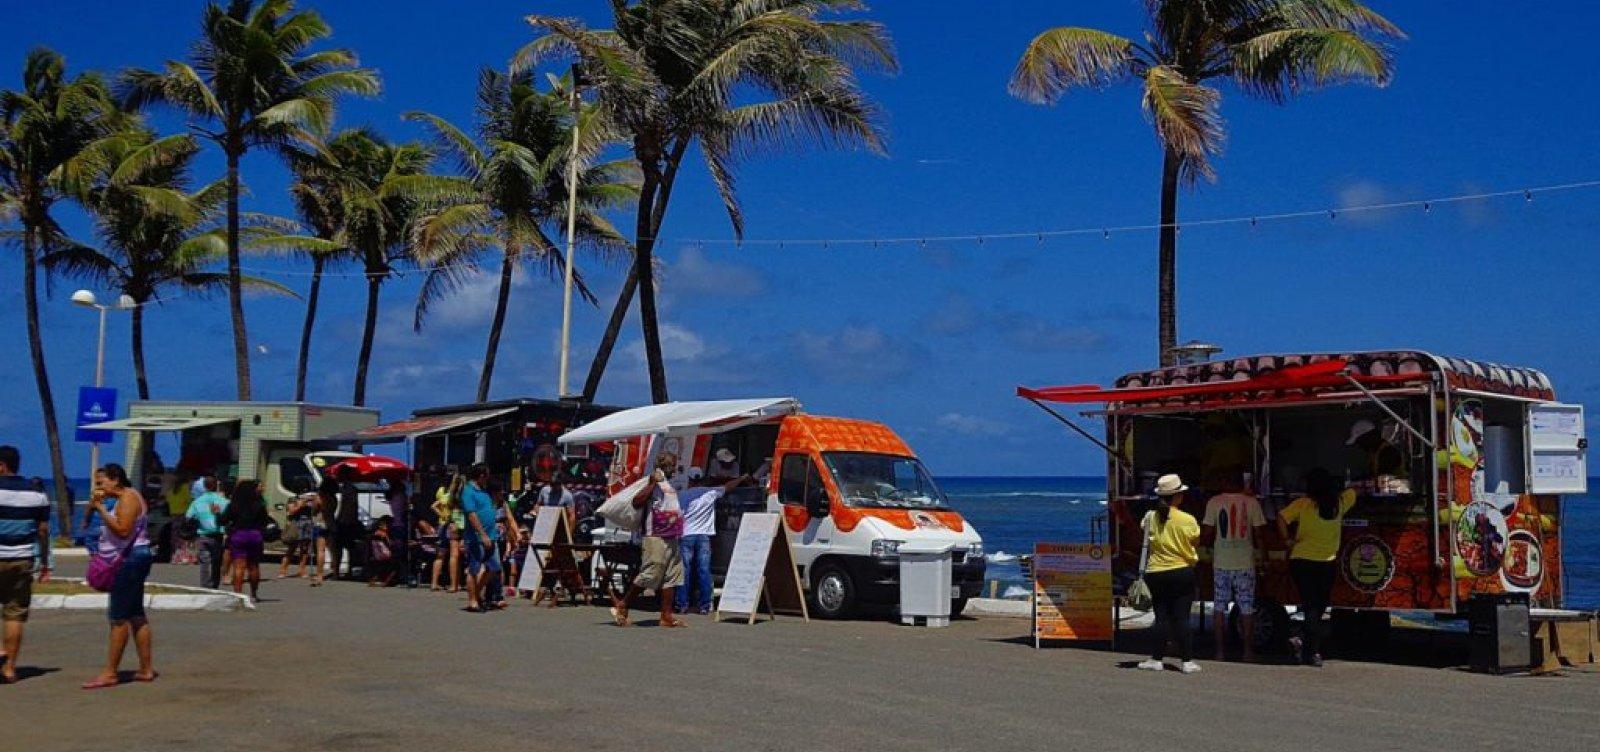 [Semop abre licenciamento para Food Truck em Salvador]